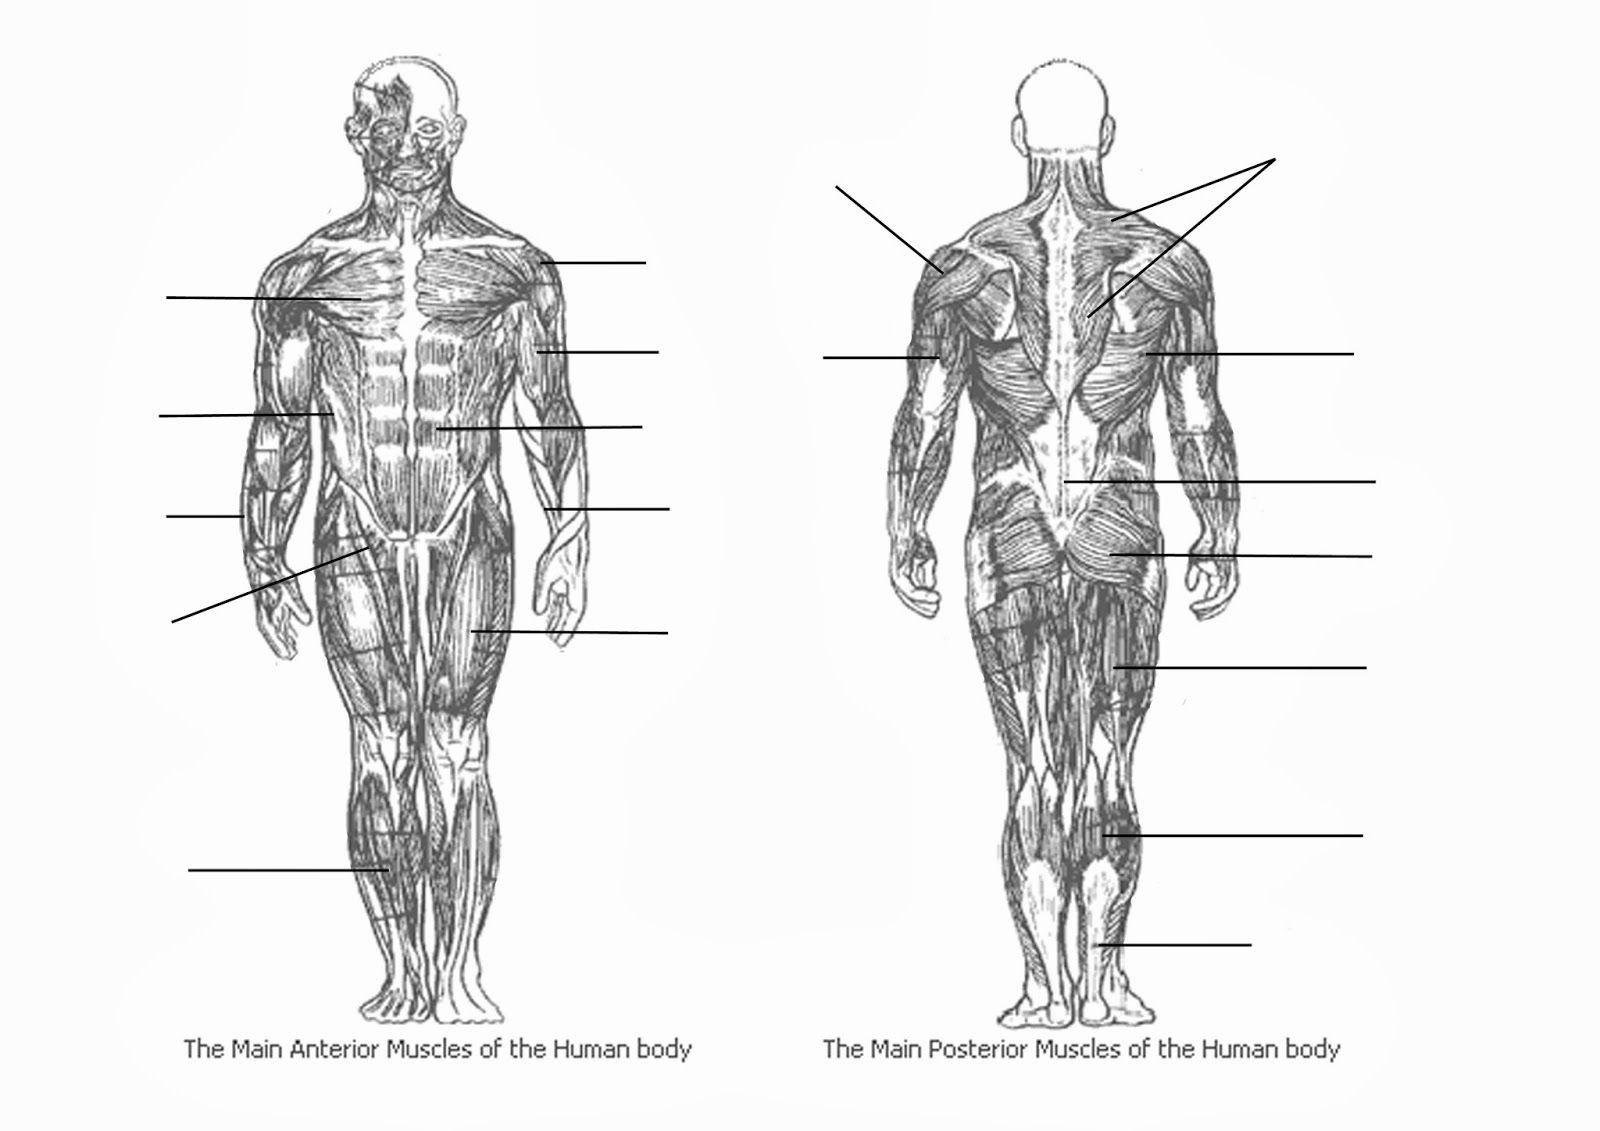 Blank Muscle Diagram To Label Elegant Muscle Diagram Blank